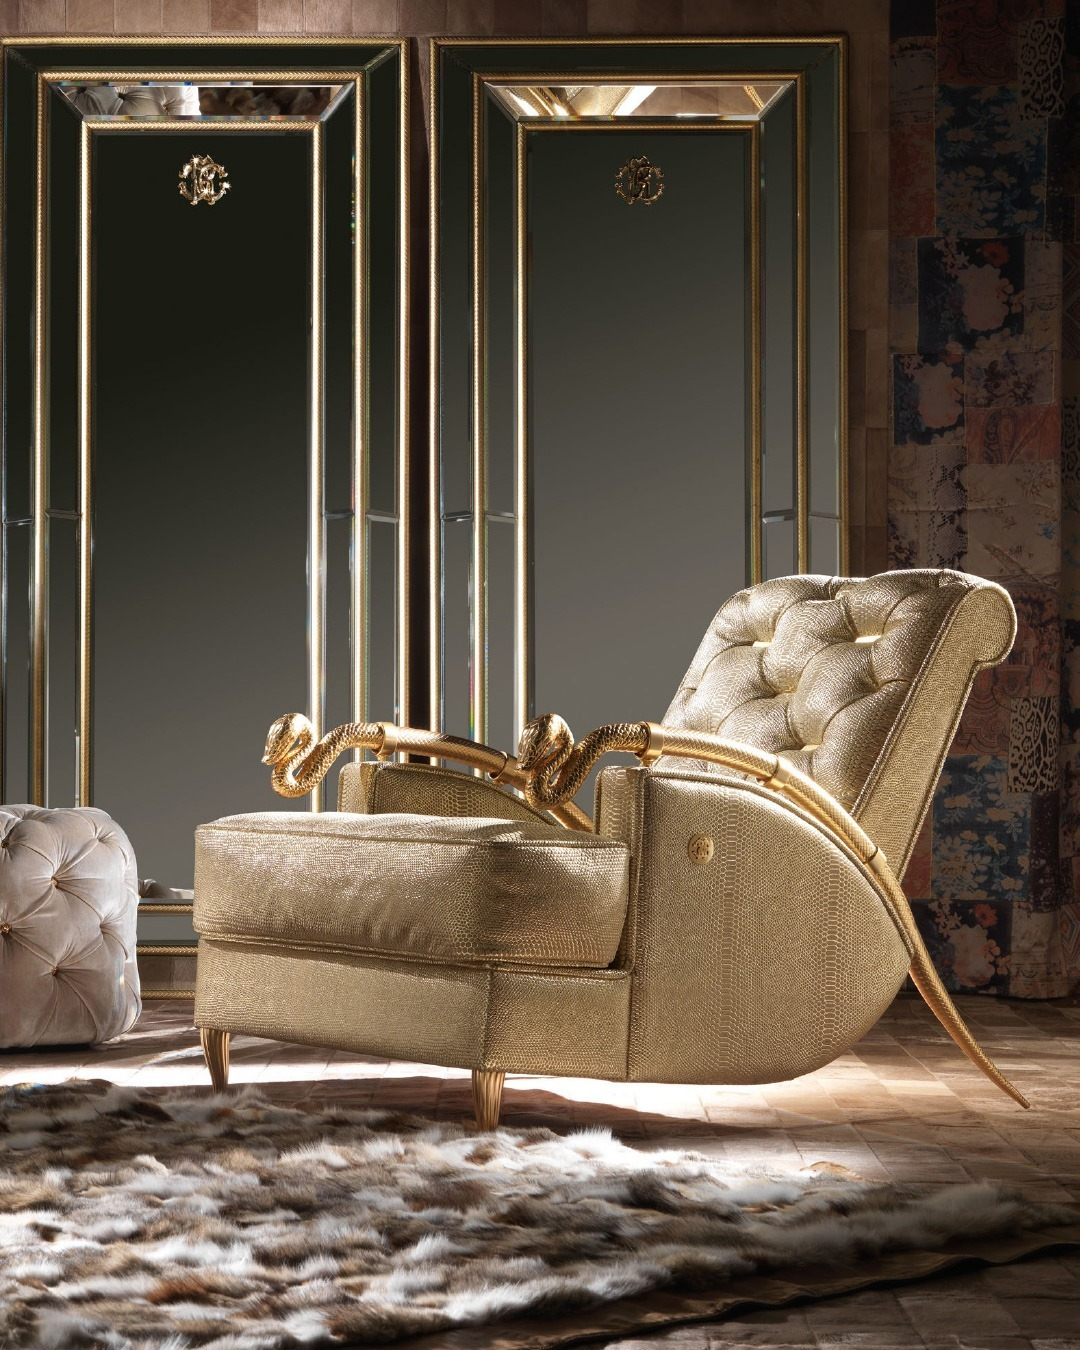 Da Vinci Lifestyle: Italian Luxury Furniture